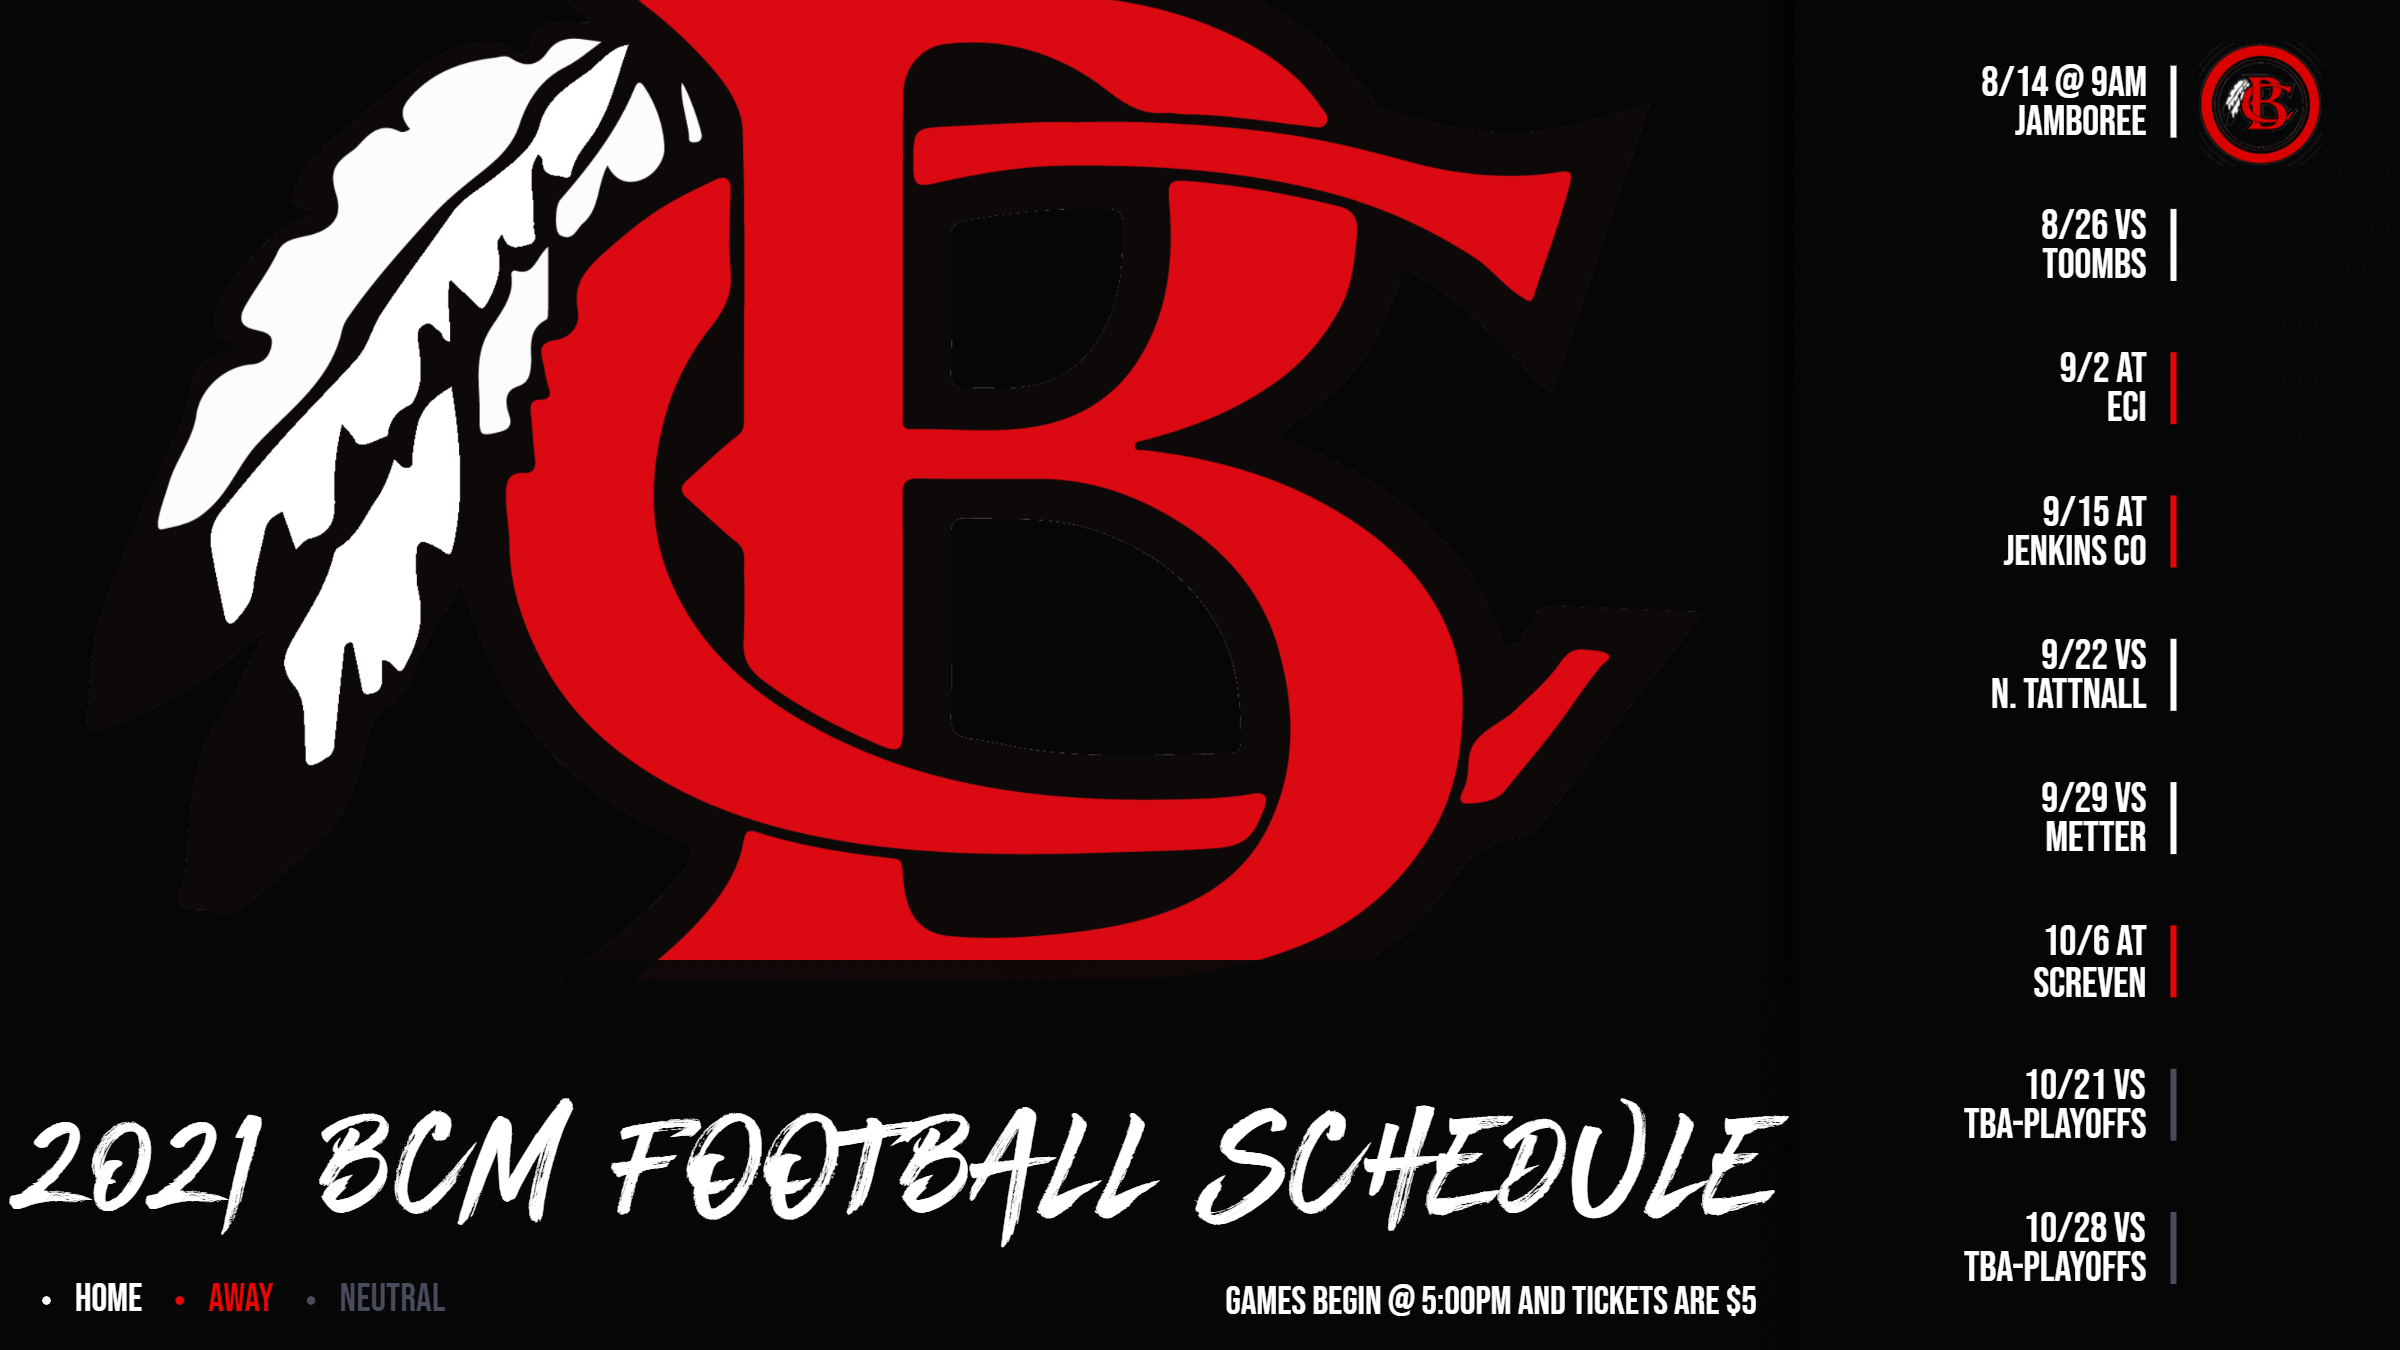 Lower School Football Schedule 2021